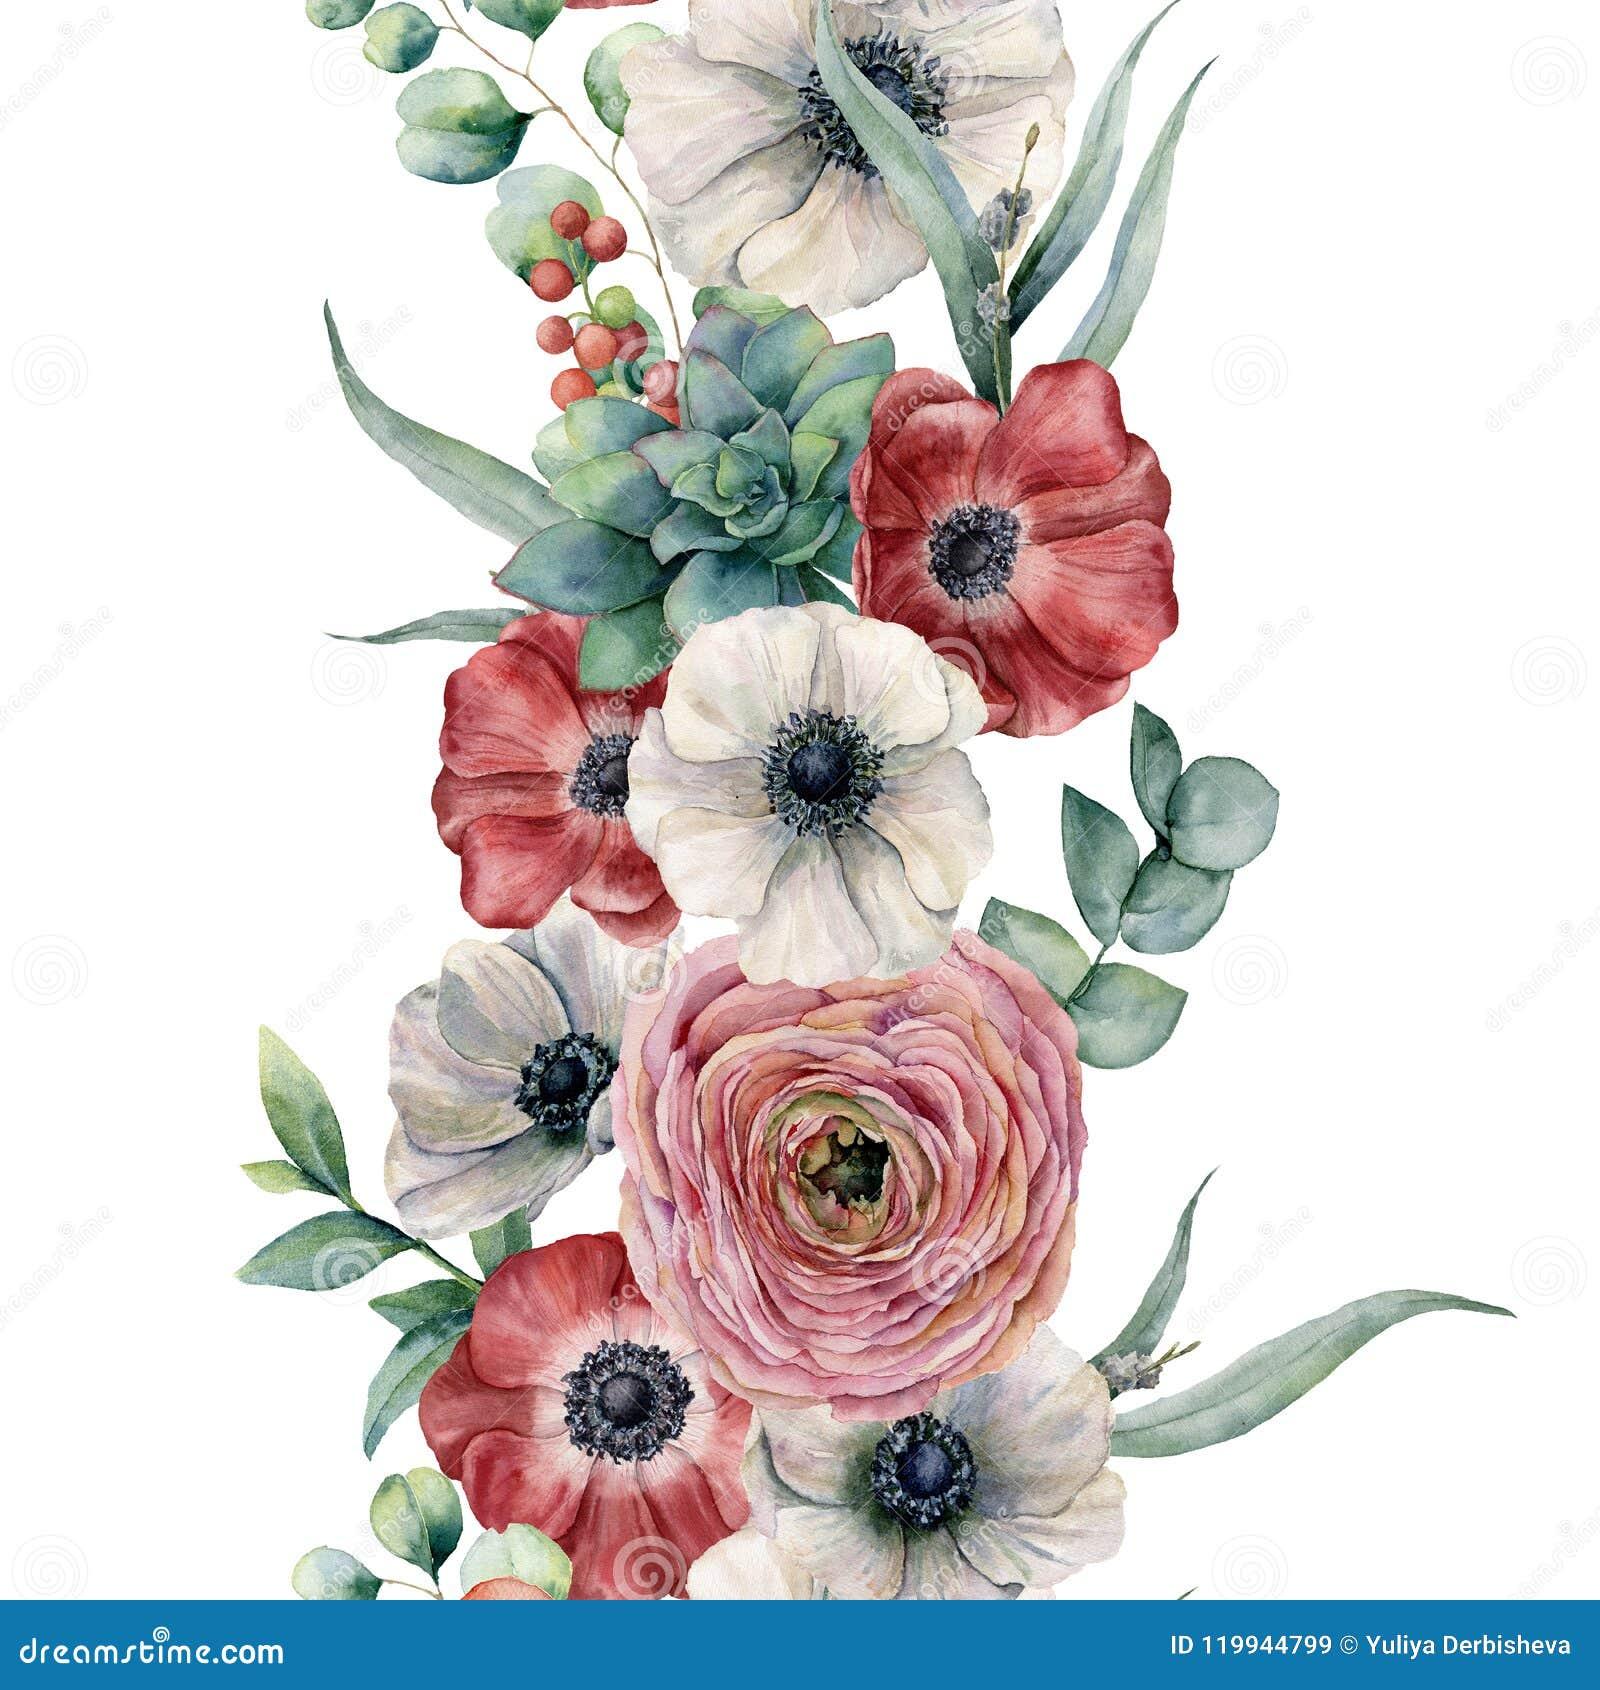 Dark Red Roses Flowers Watercolor Botanical Art Boho: Watercolor Seamless Vertical Floral Border. Hand Painted